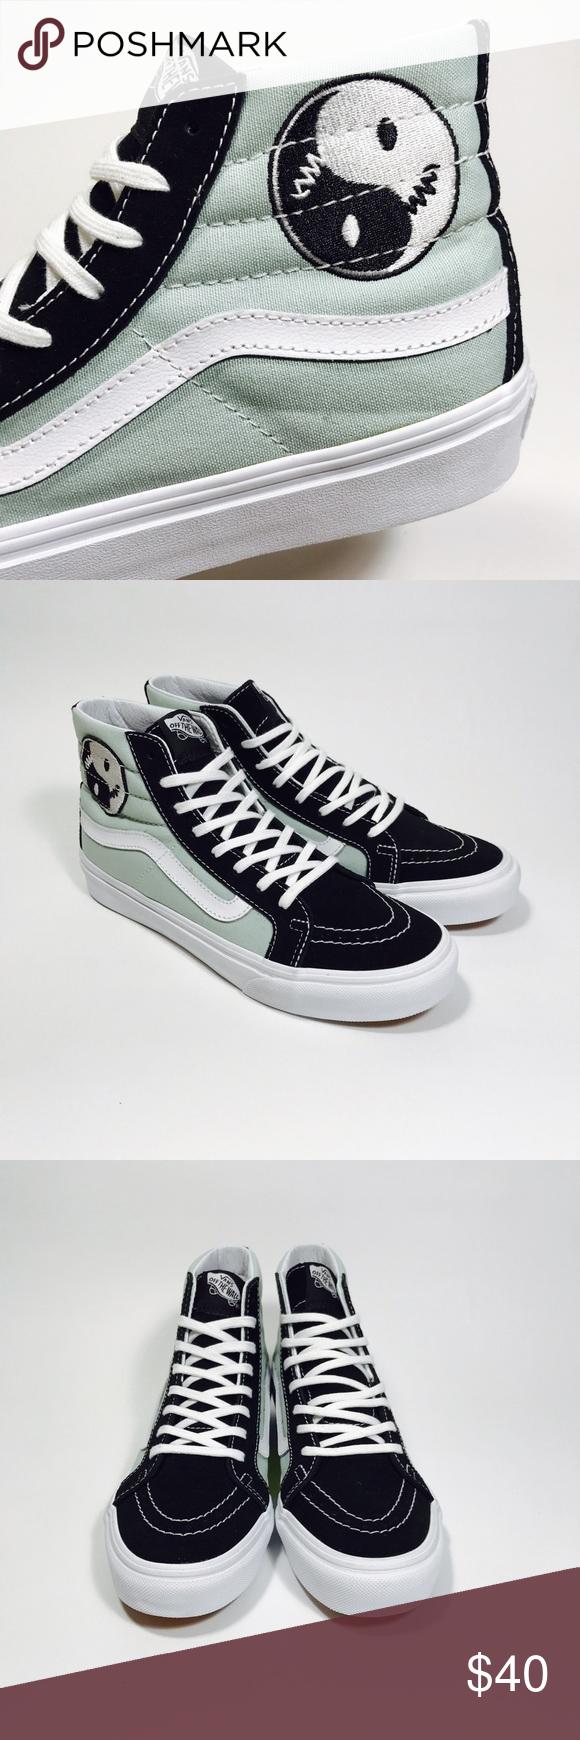 sneaker store fbe6f d7f68 sparkle converse girlhood canvas ... c730854802